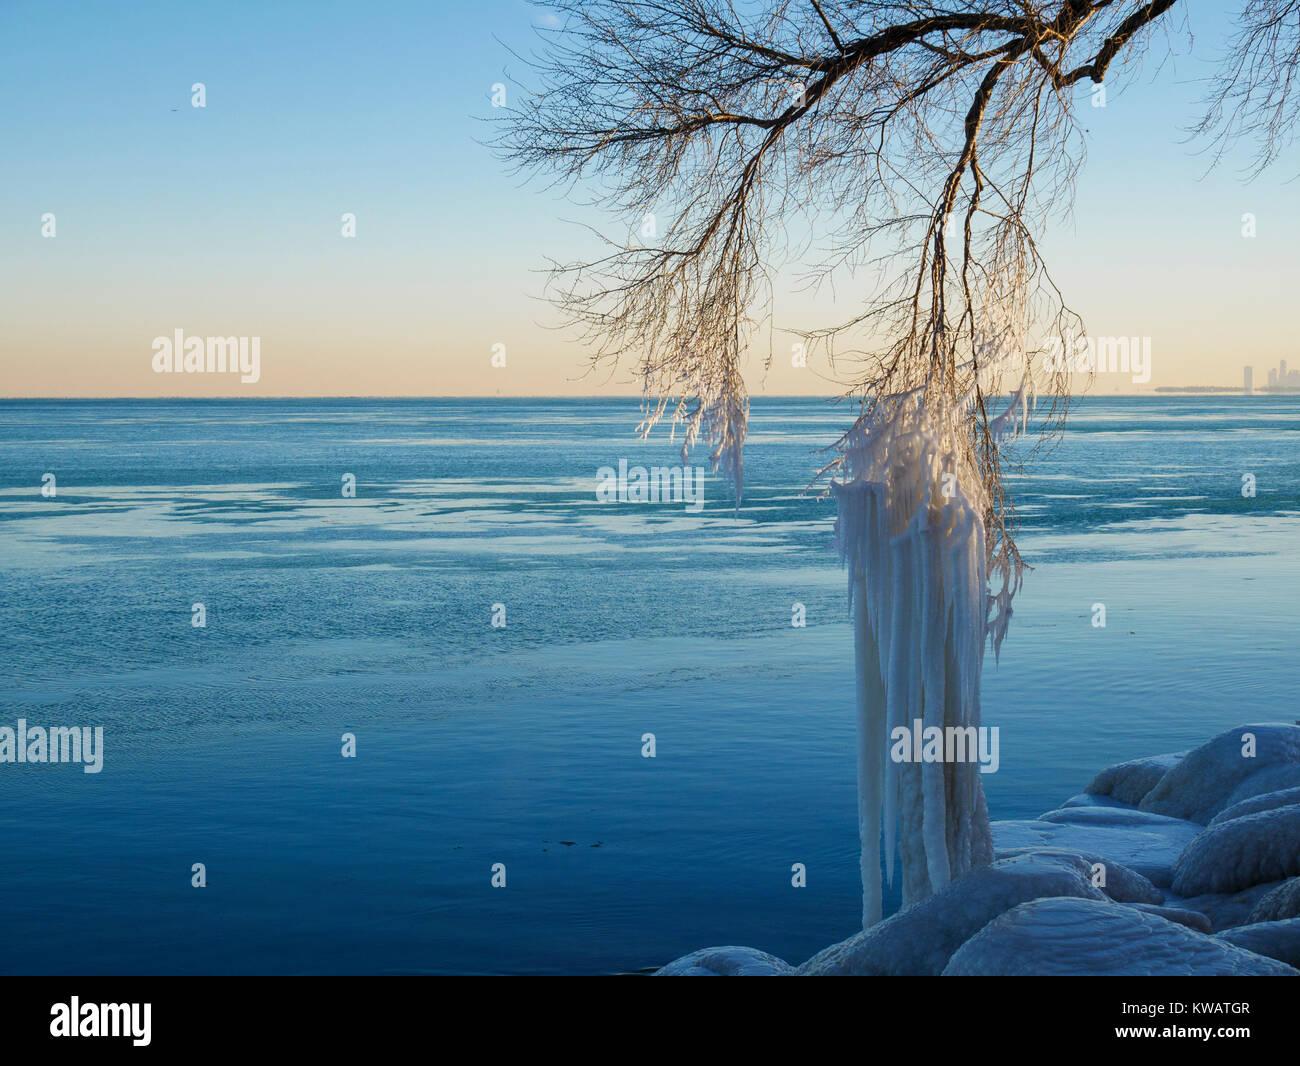 Evanston, Illinois, USA. 2nd January 2018.  A frigid Lake Michigan scene as temperatures climbed to 10ºF/-12ºC - Stock Image